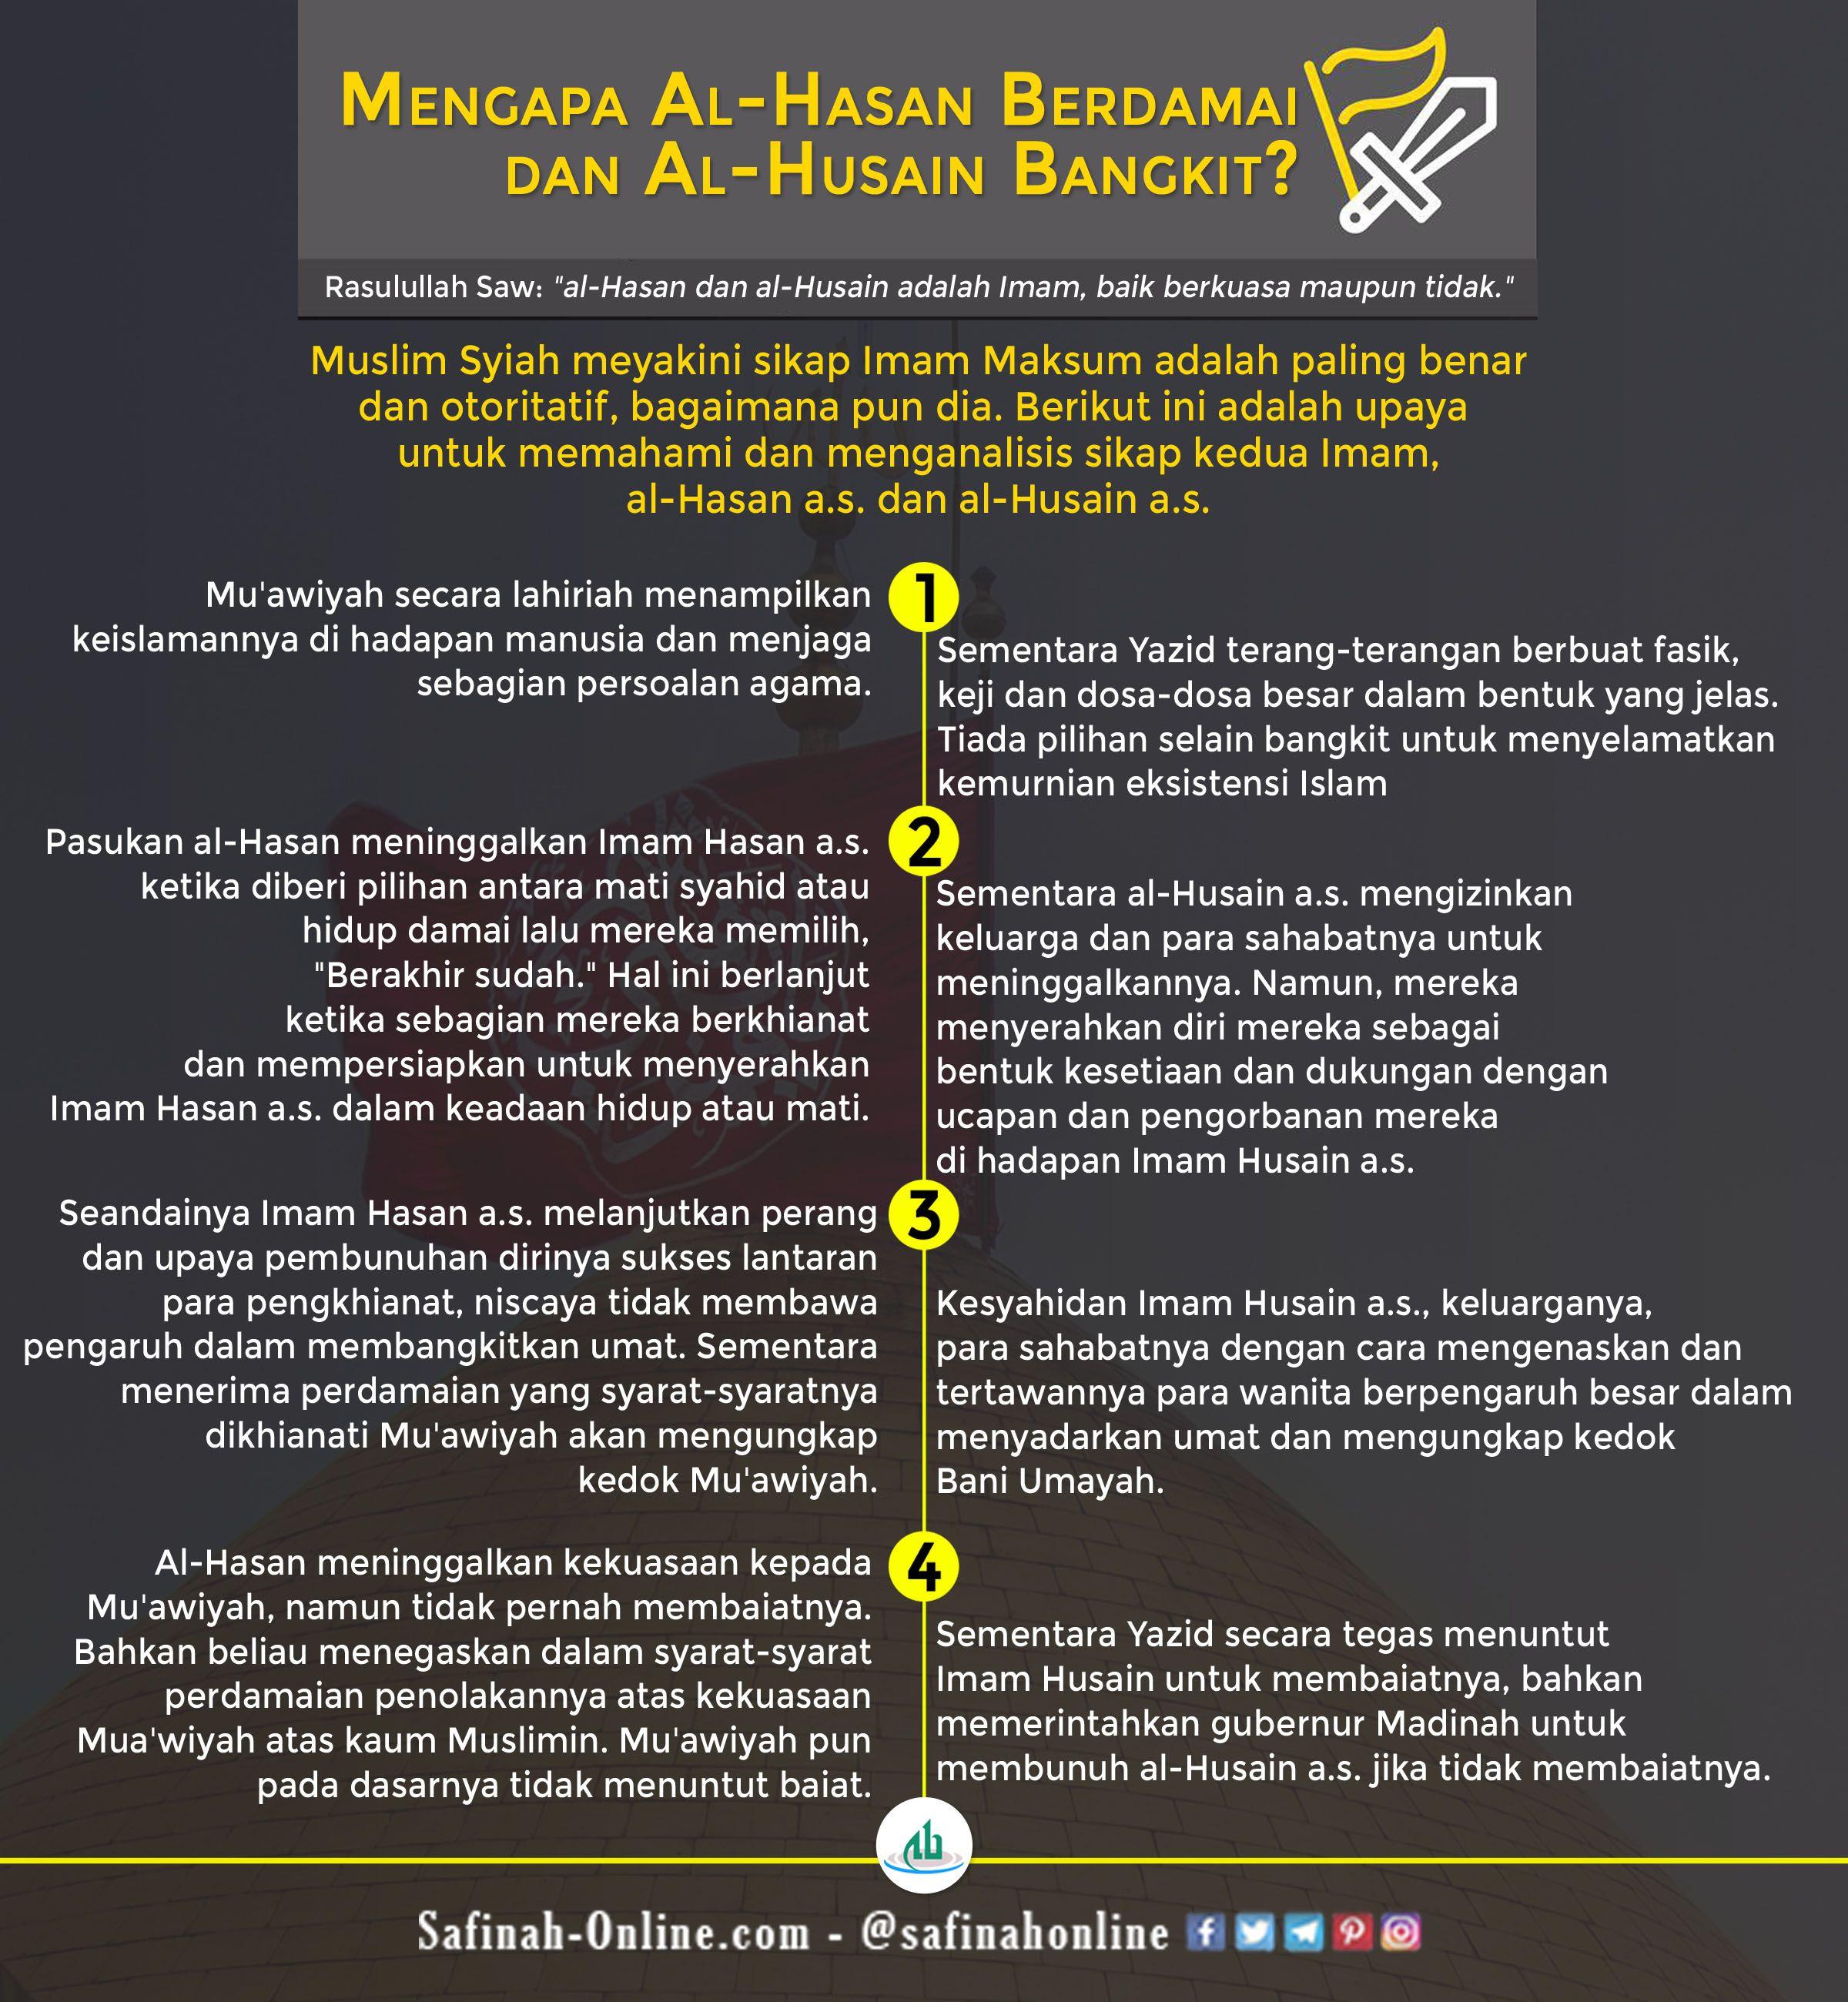 Infografis Mengapa Al Hasan Berdamai Dan Al Husain Bangkit